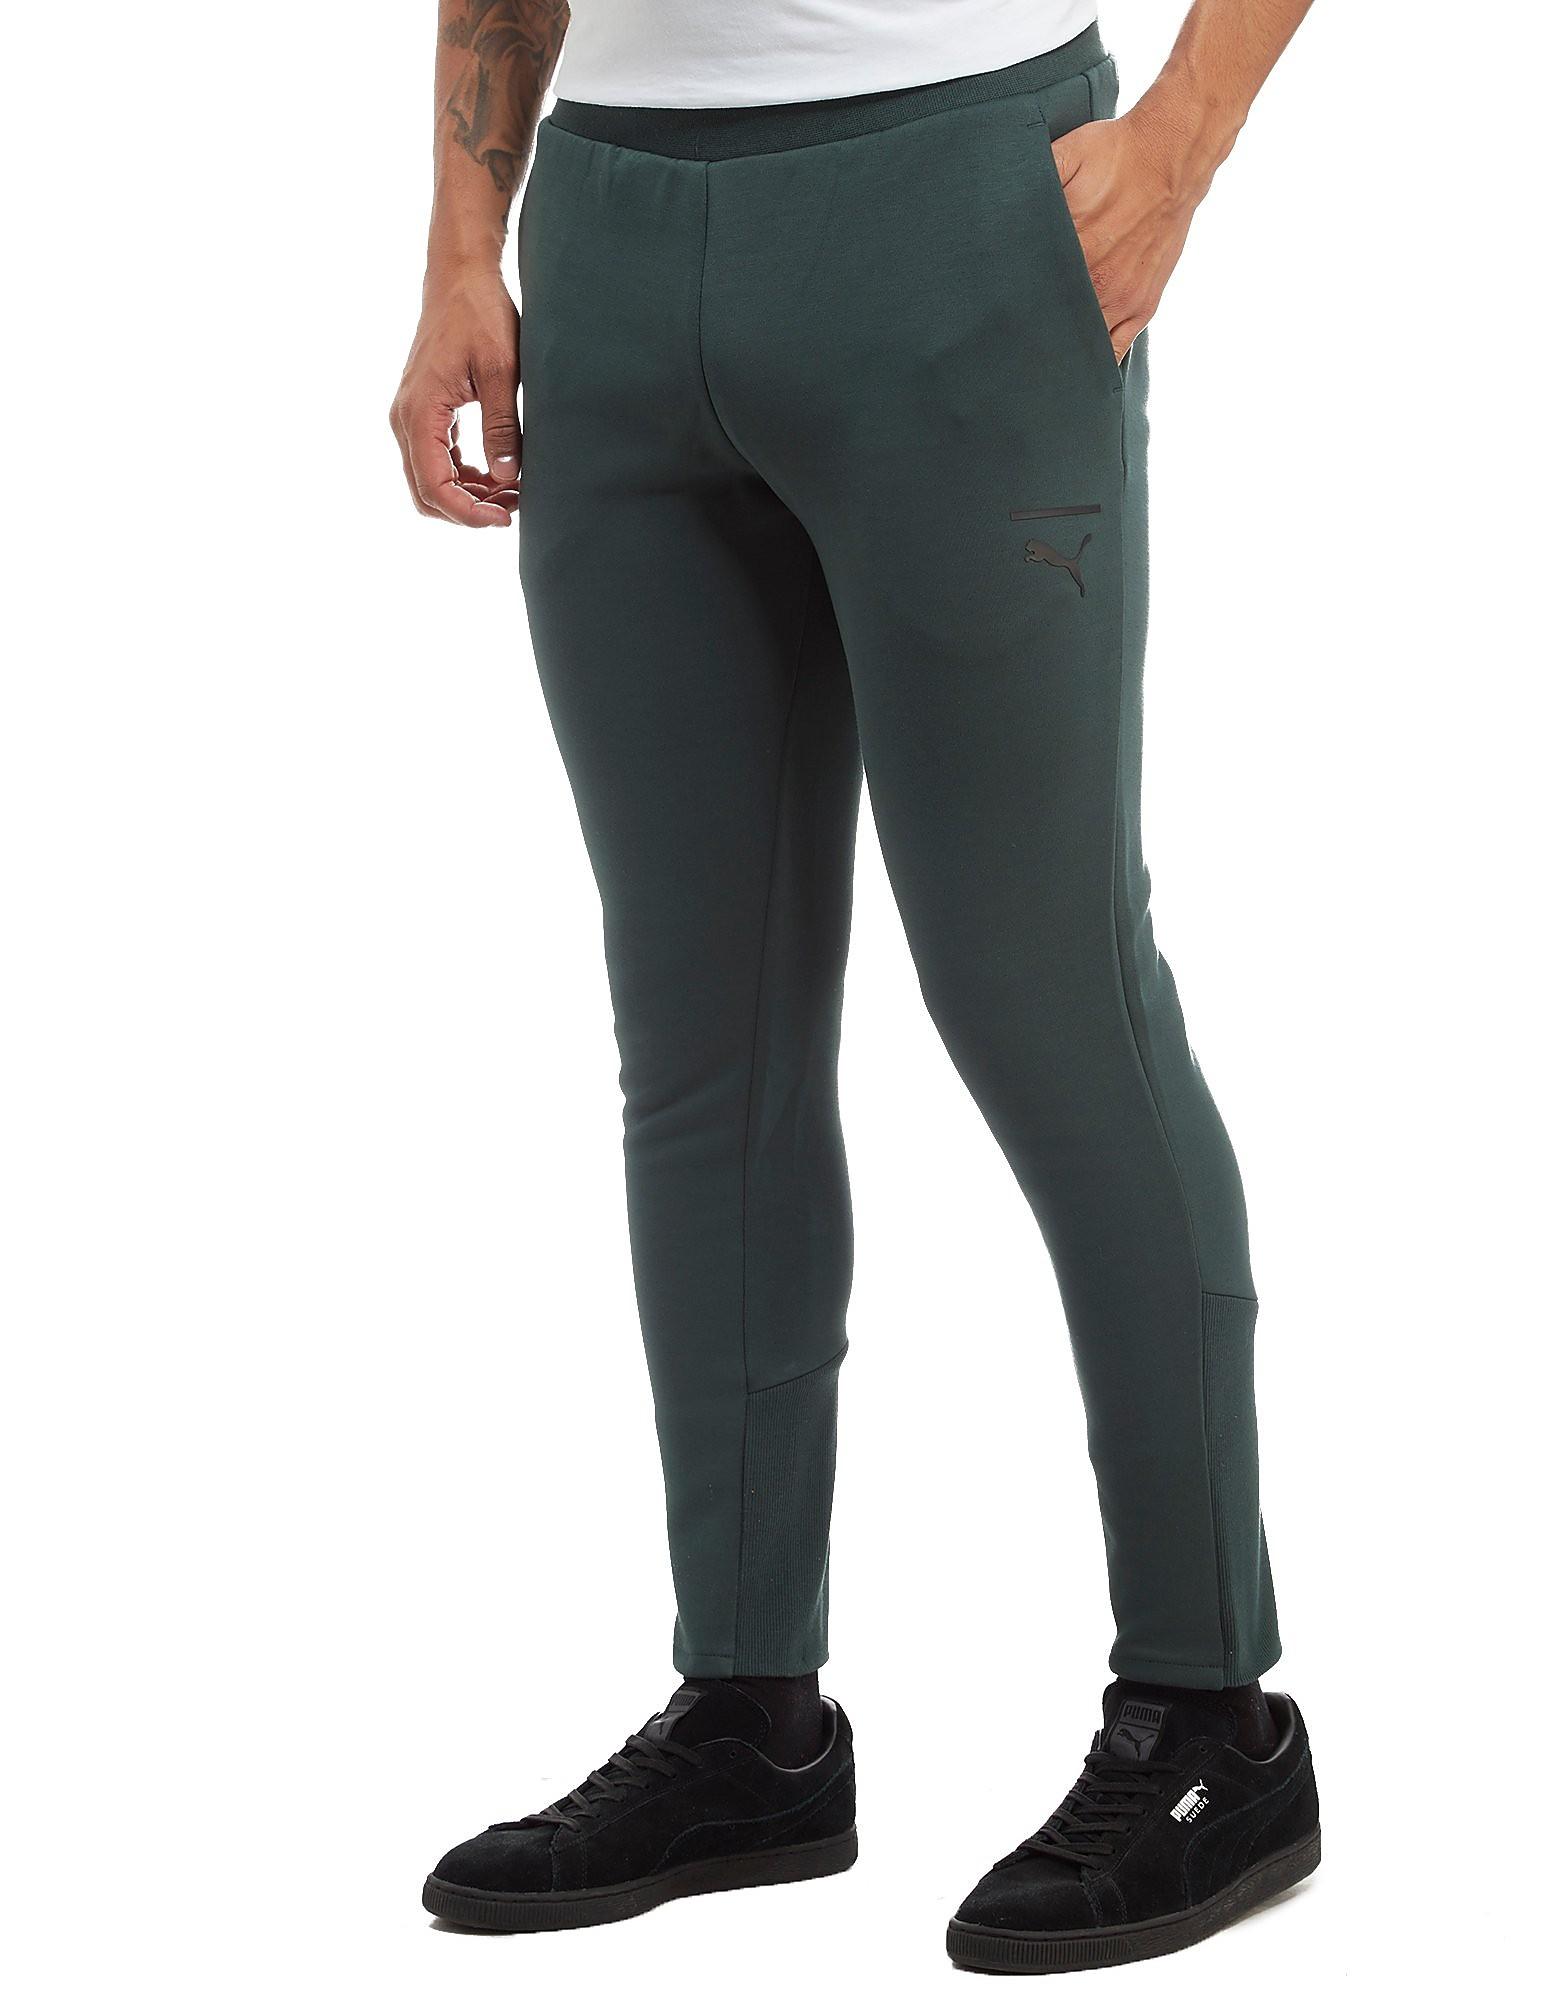 PUMA Evostripe Proknit Pants